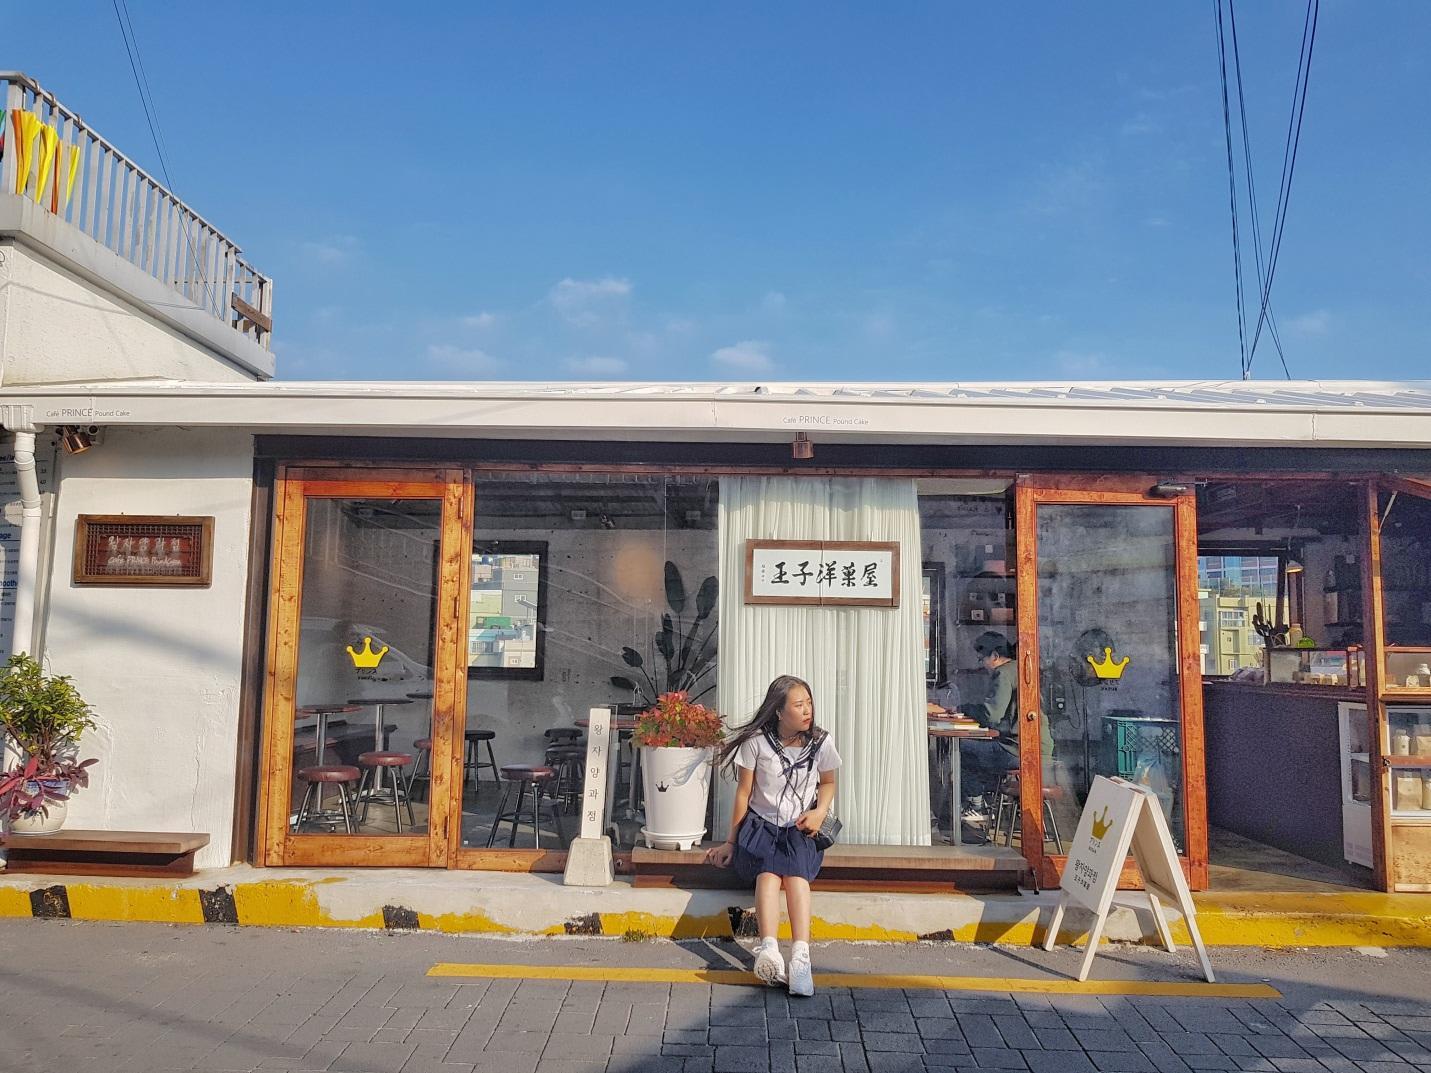 tiệm cafe ở gamcheon